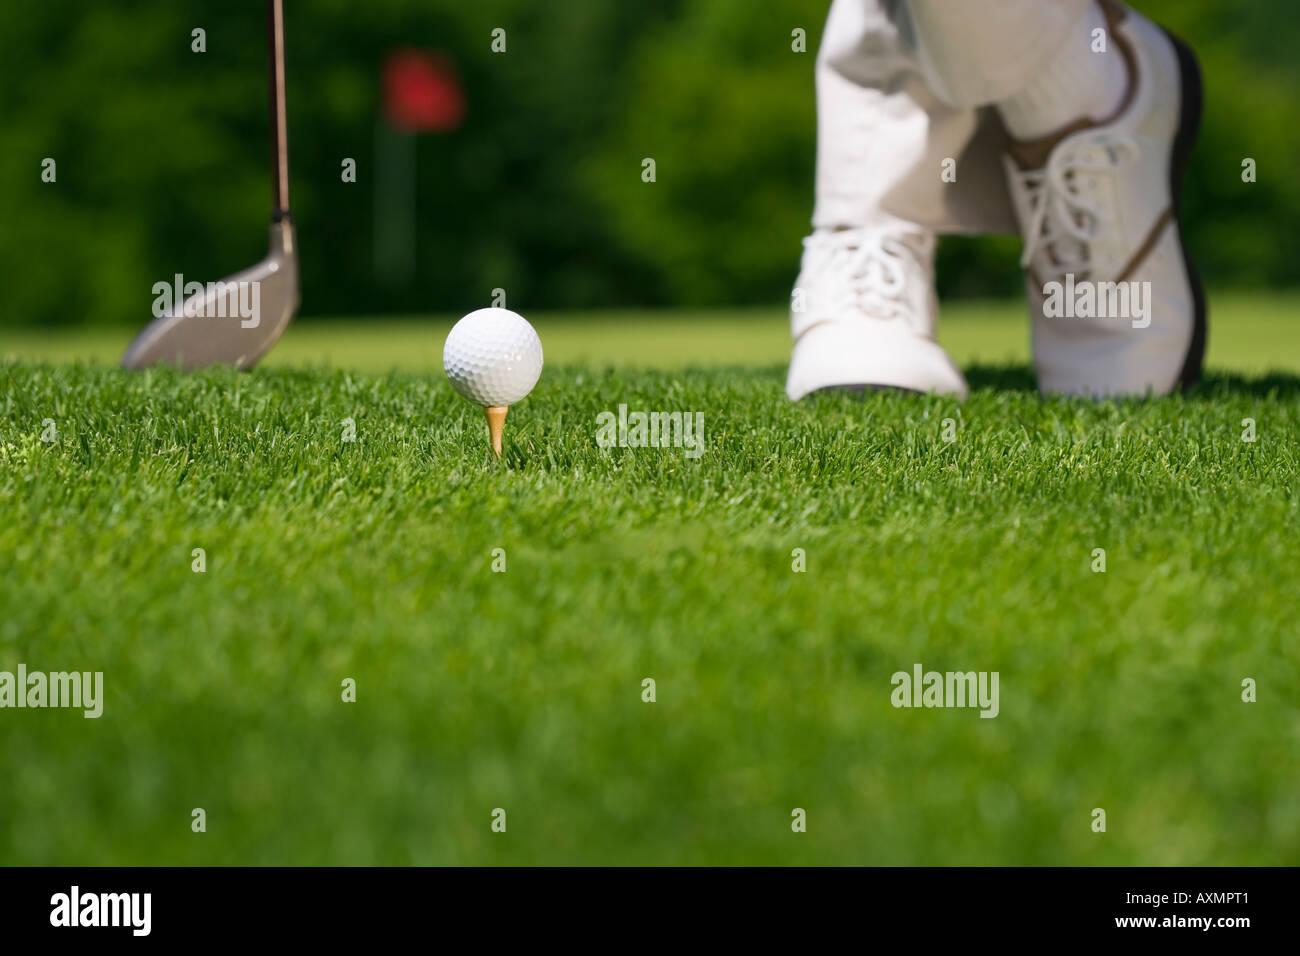 Golfer preparing to tee off - Stock Image